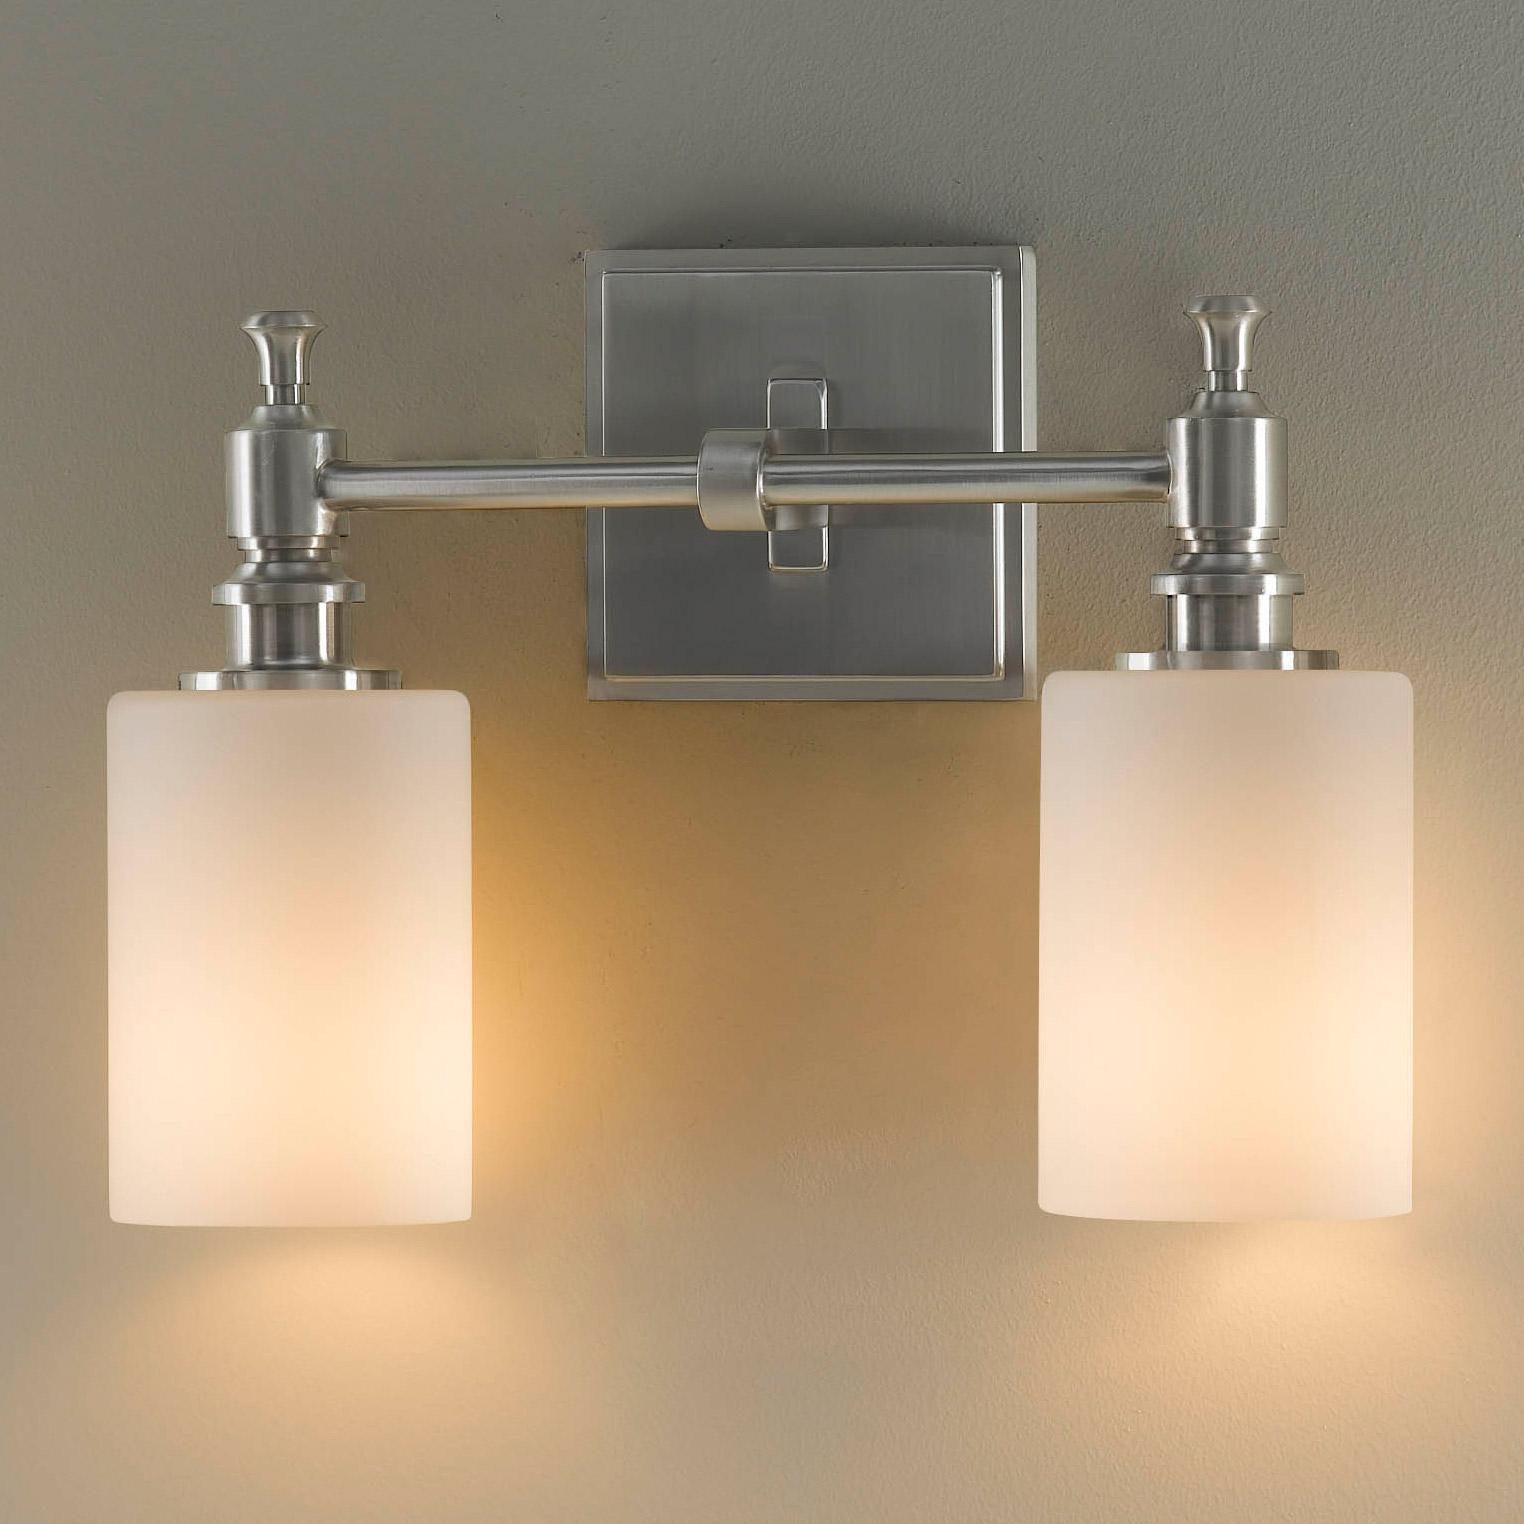 Murray Feiss Bathroom Lighting: Murray Feiss VS16102-BS Sullivan ADA Compliant Vanity Light